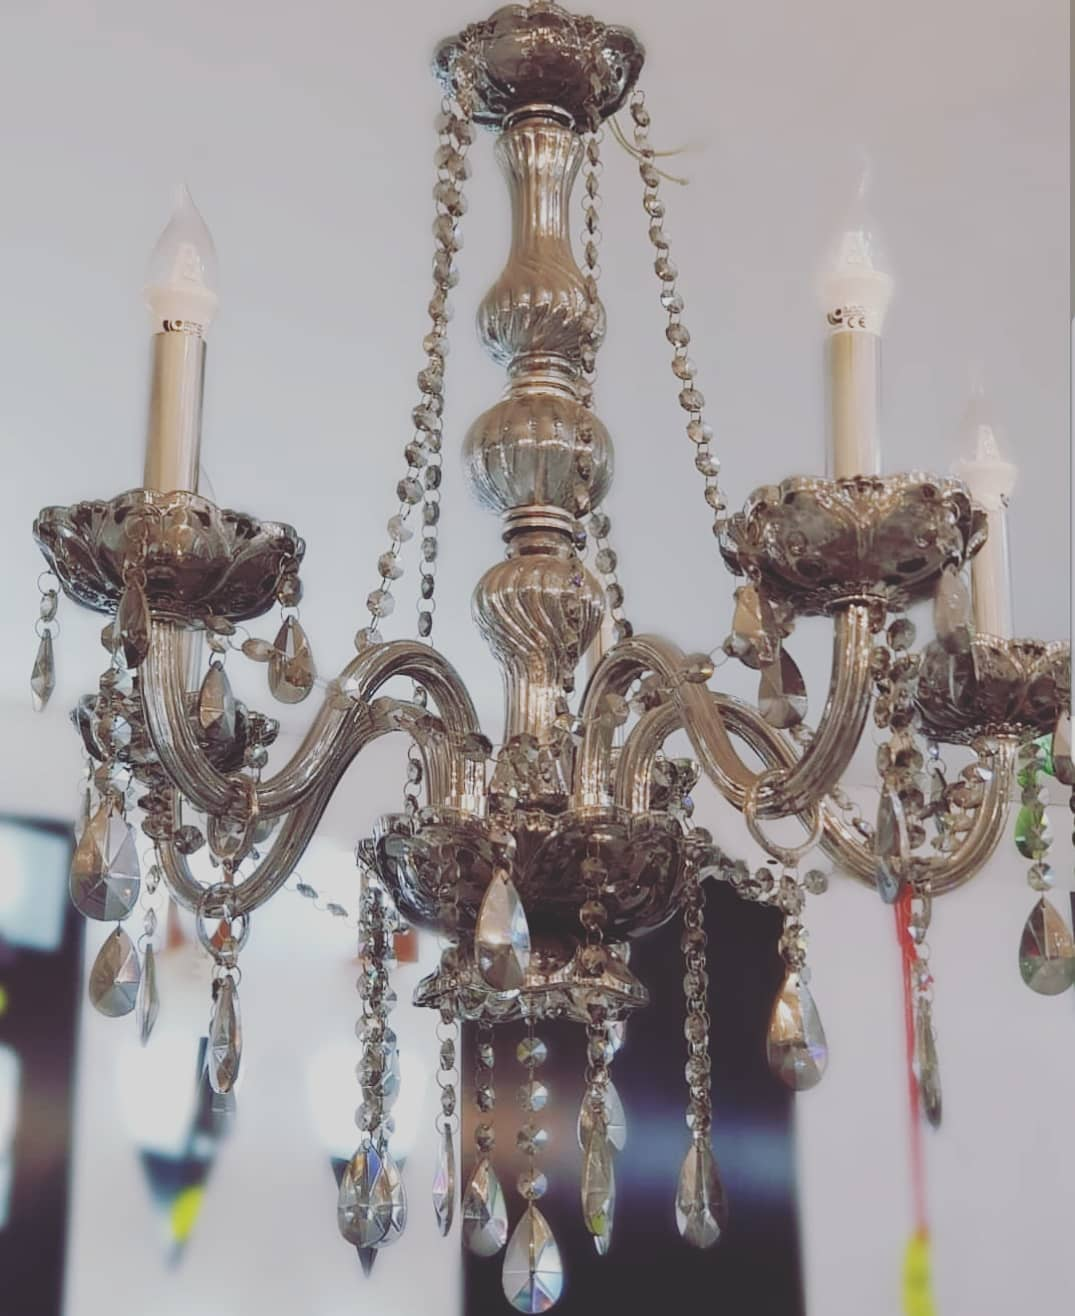 Candelabro de vidro fumado, 5 luzes. Medidas: 85 cm de altura x 55 cm de diâmetro ....